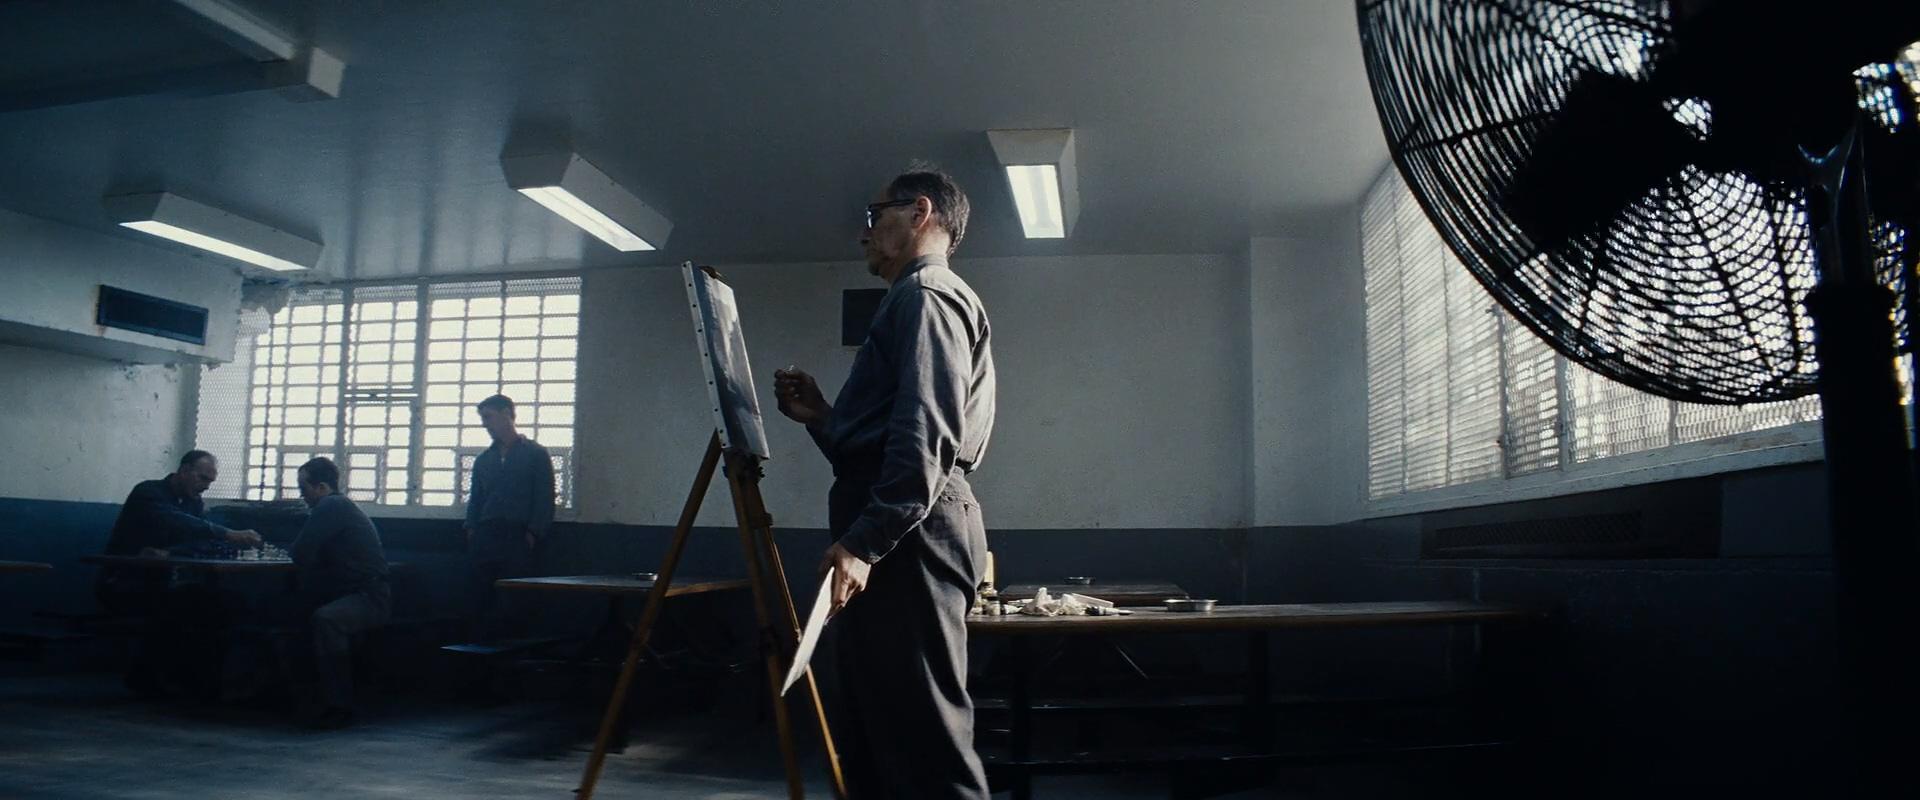 Mark Rylance in Bridge of Spies (2015)